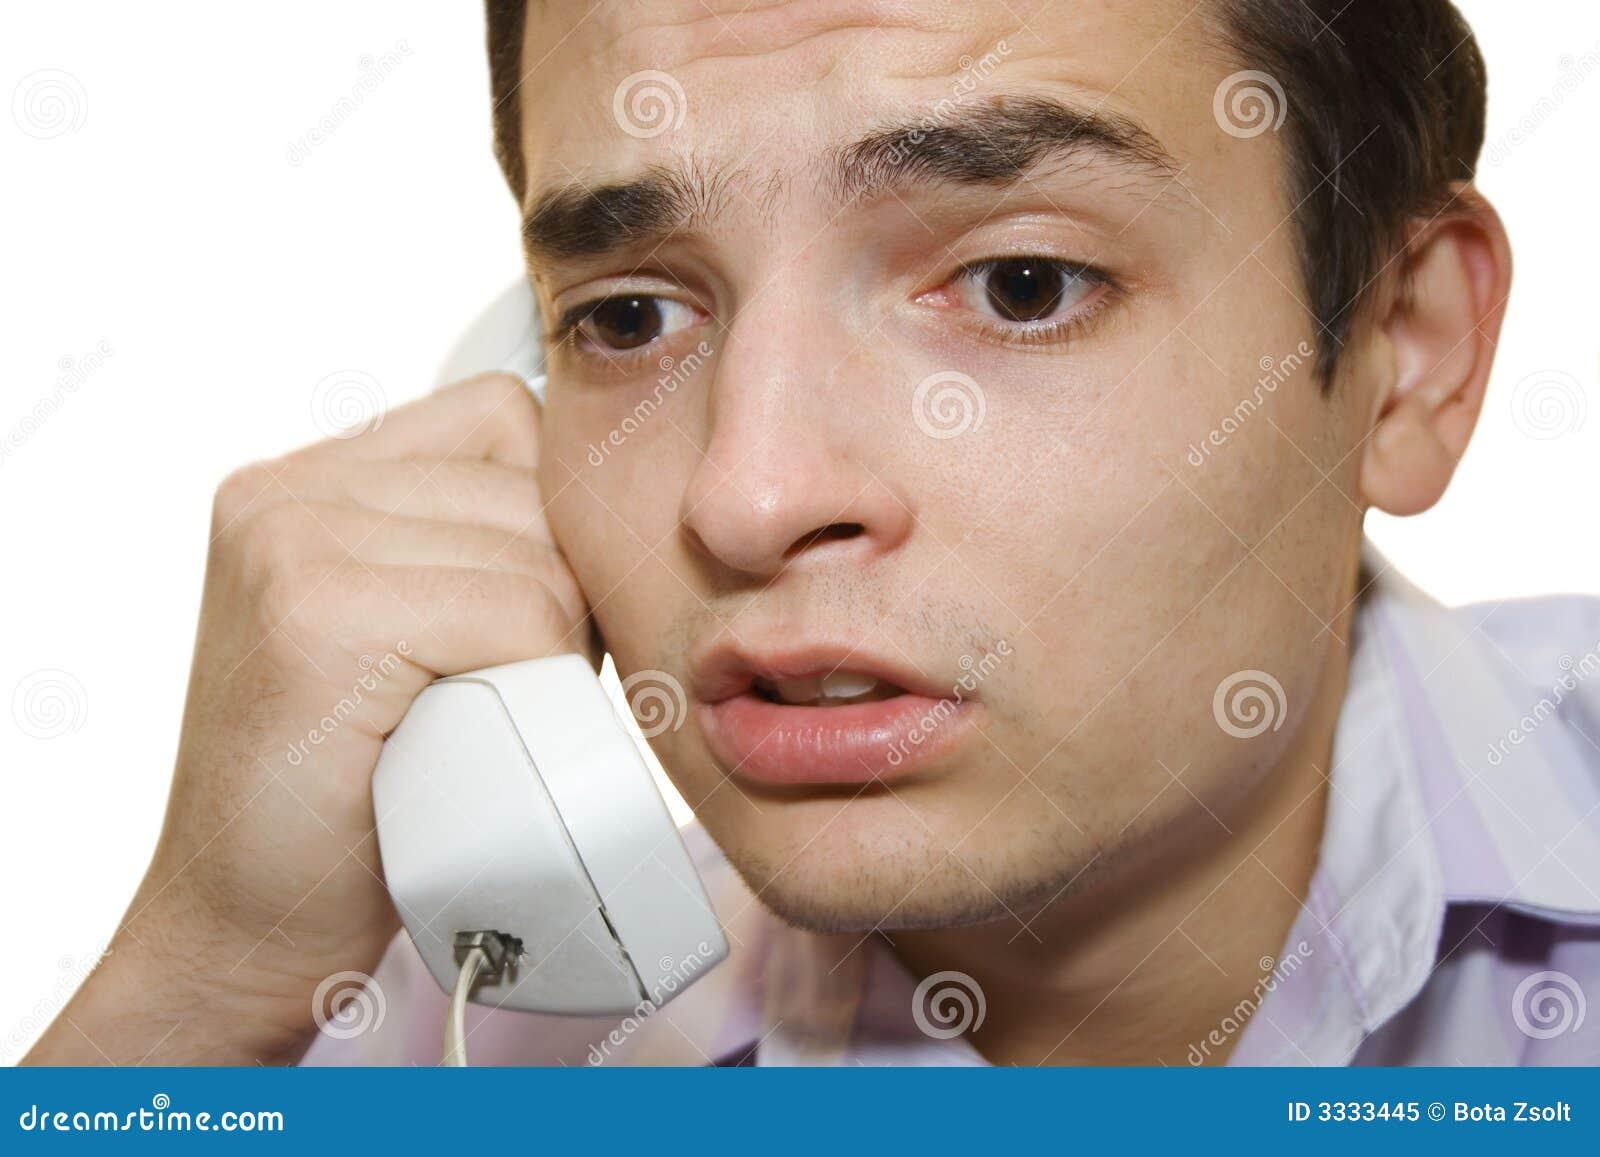 By telephone I.